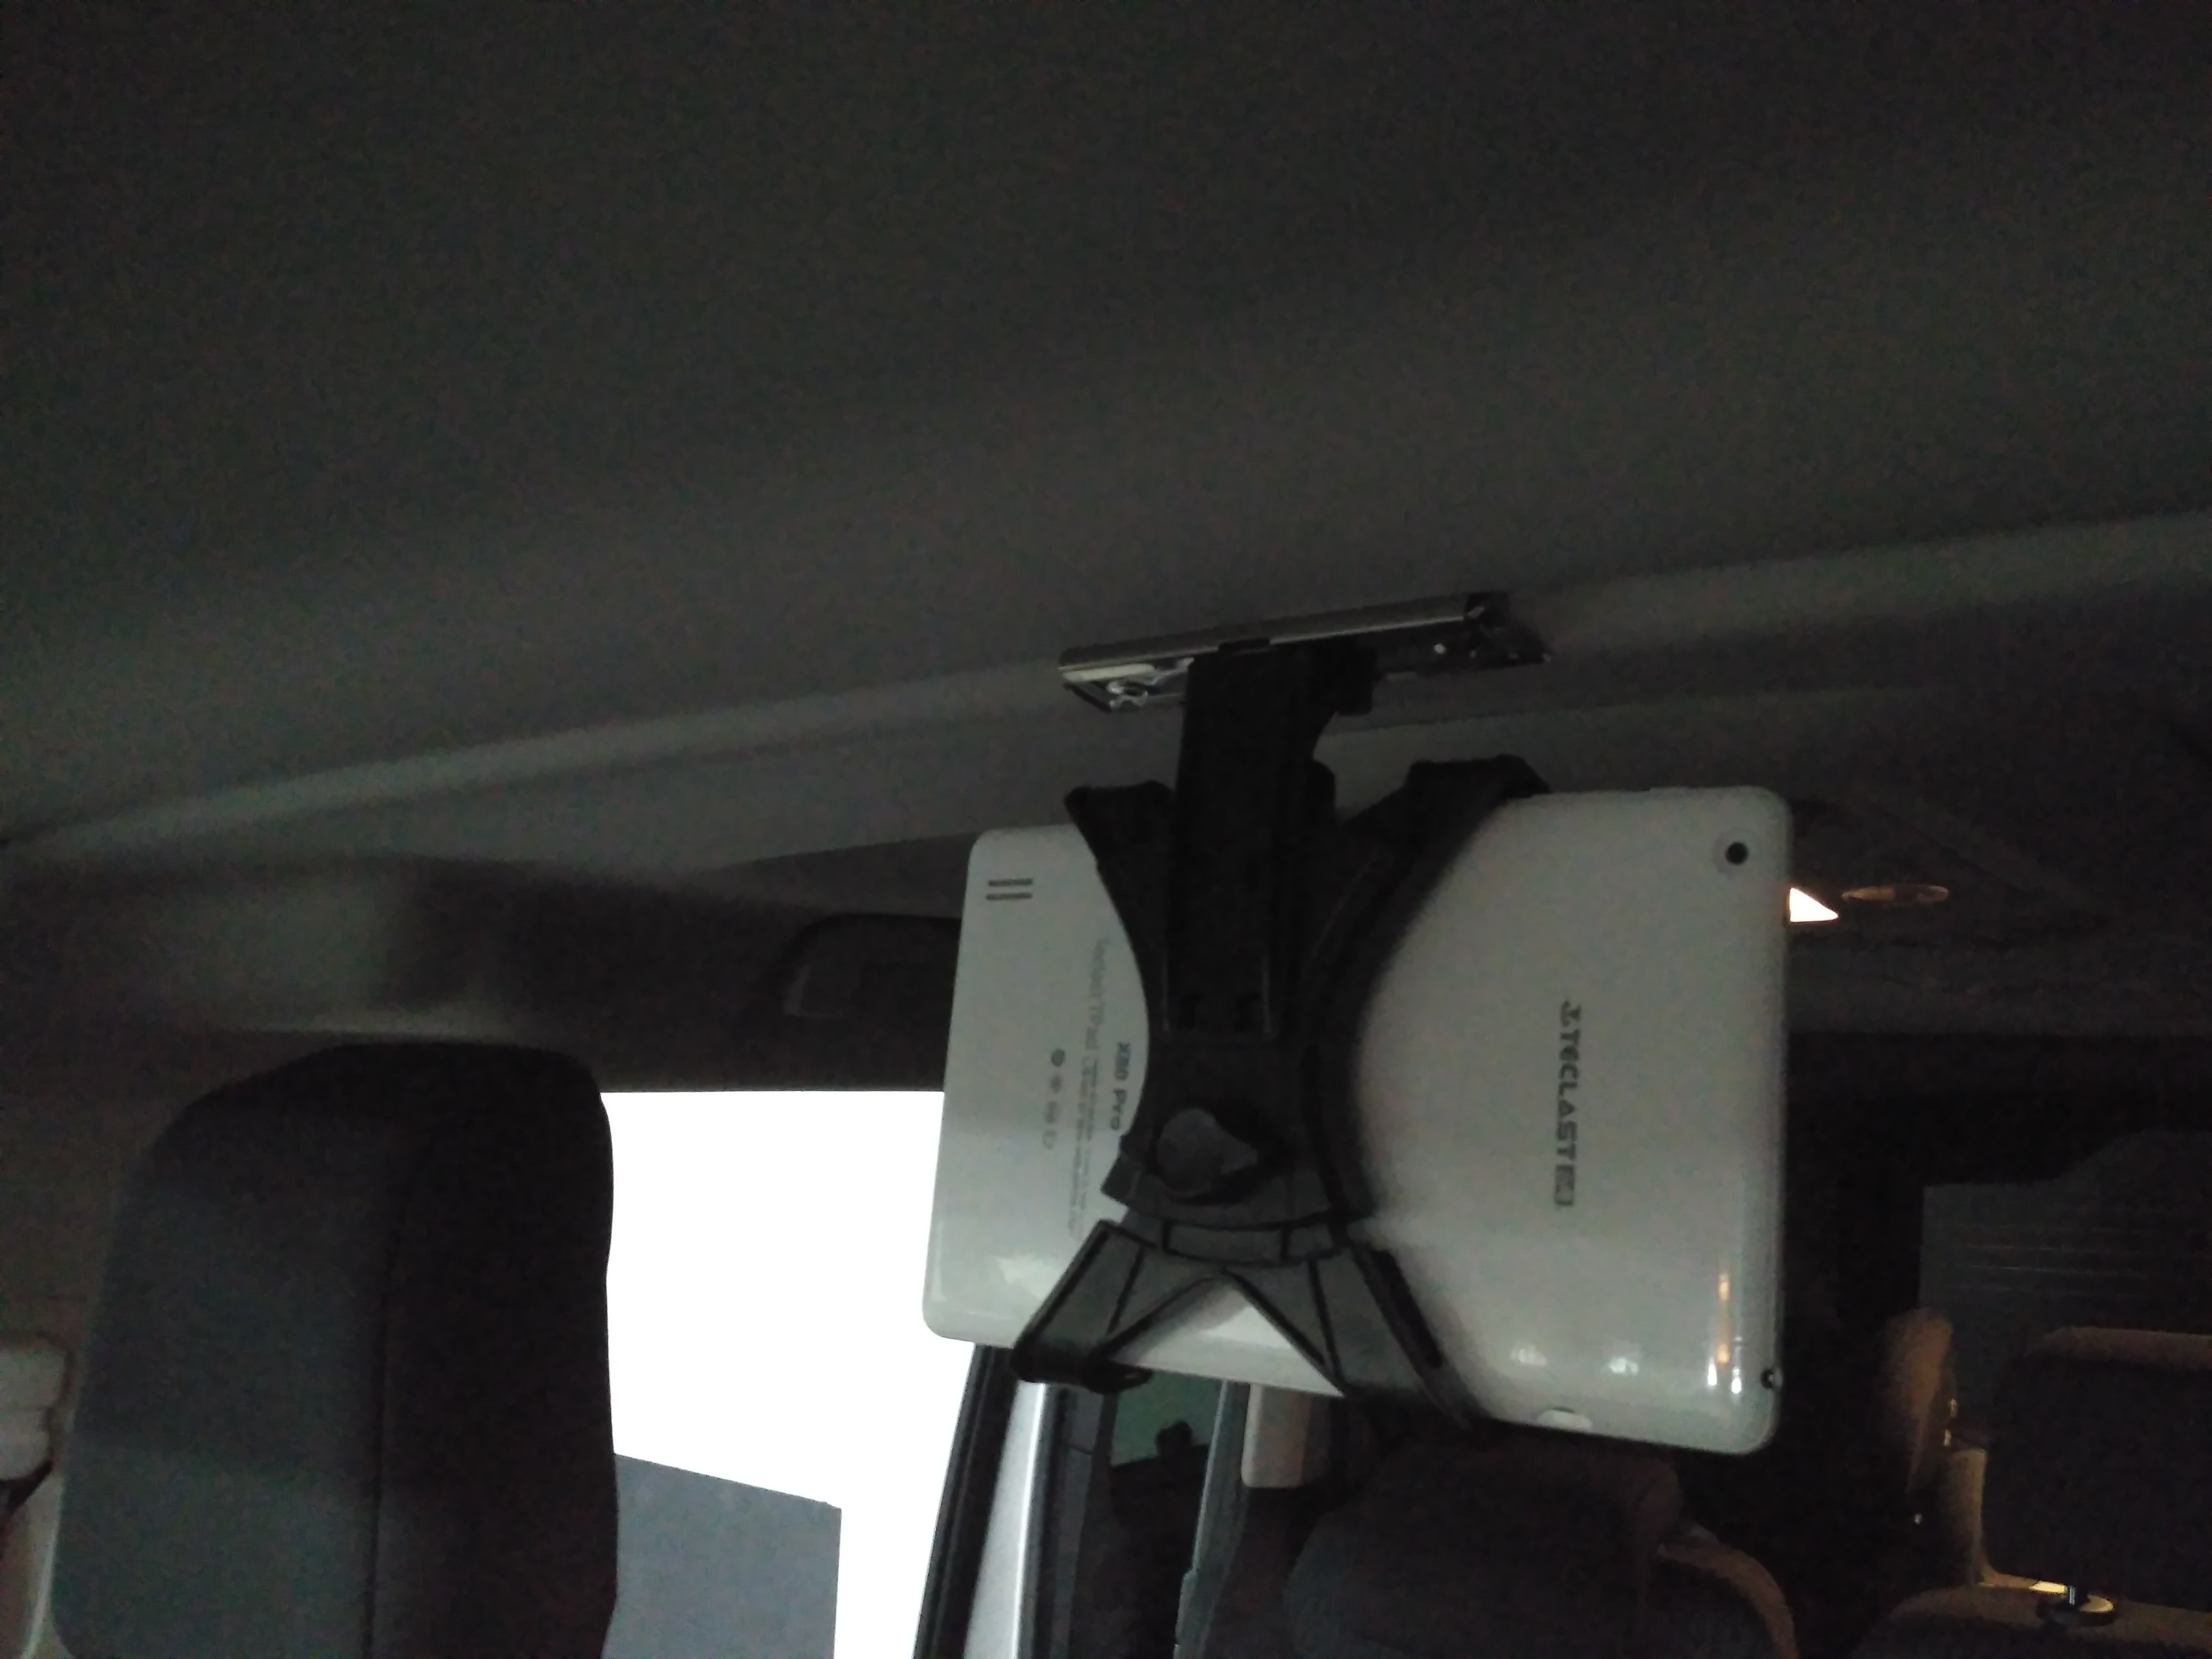 Soporte Tablet Foro Citroën Spacetourer Traveller Y Proace